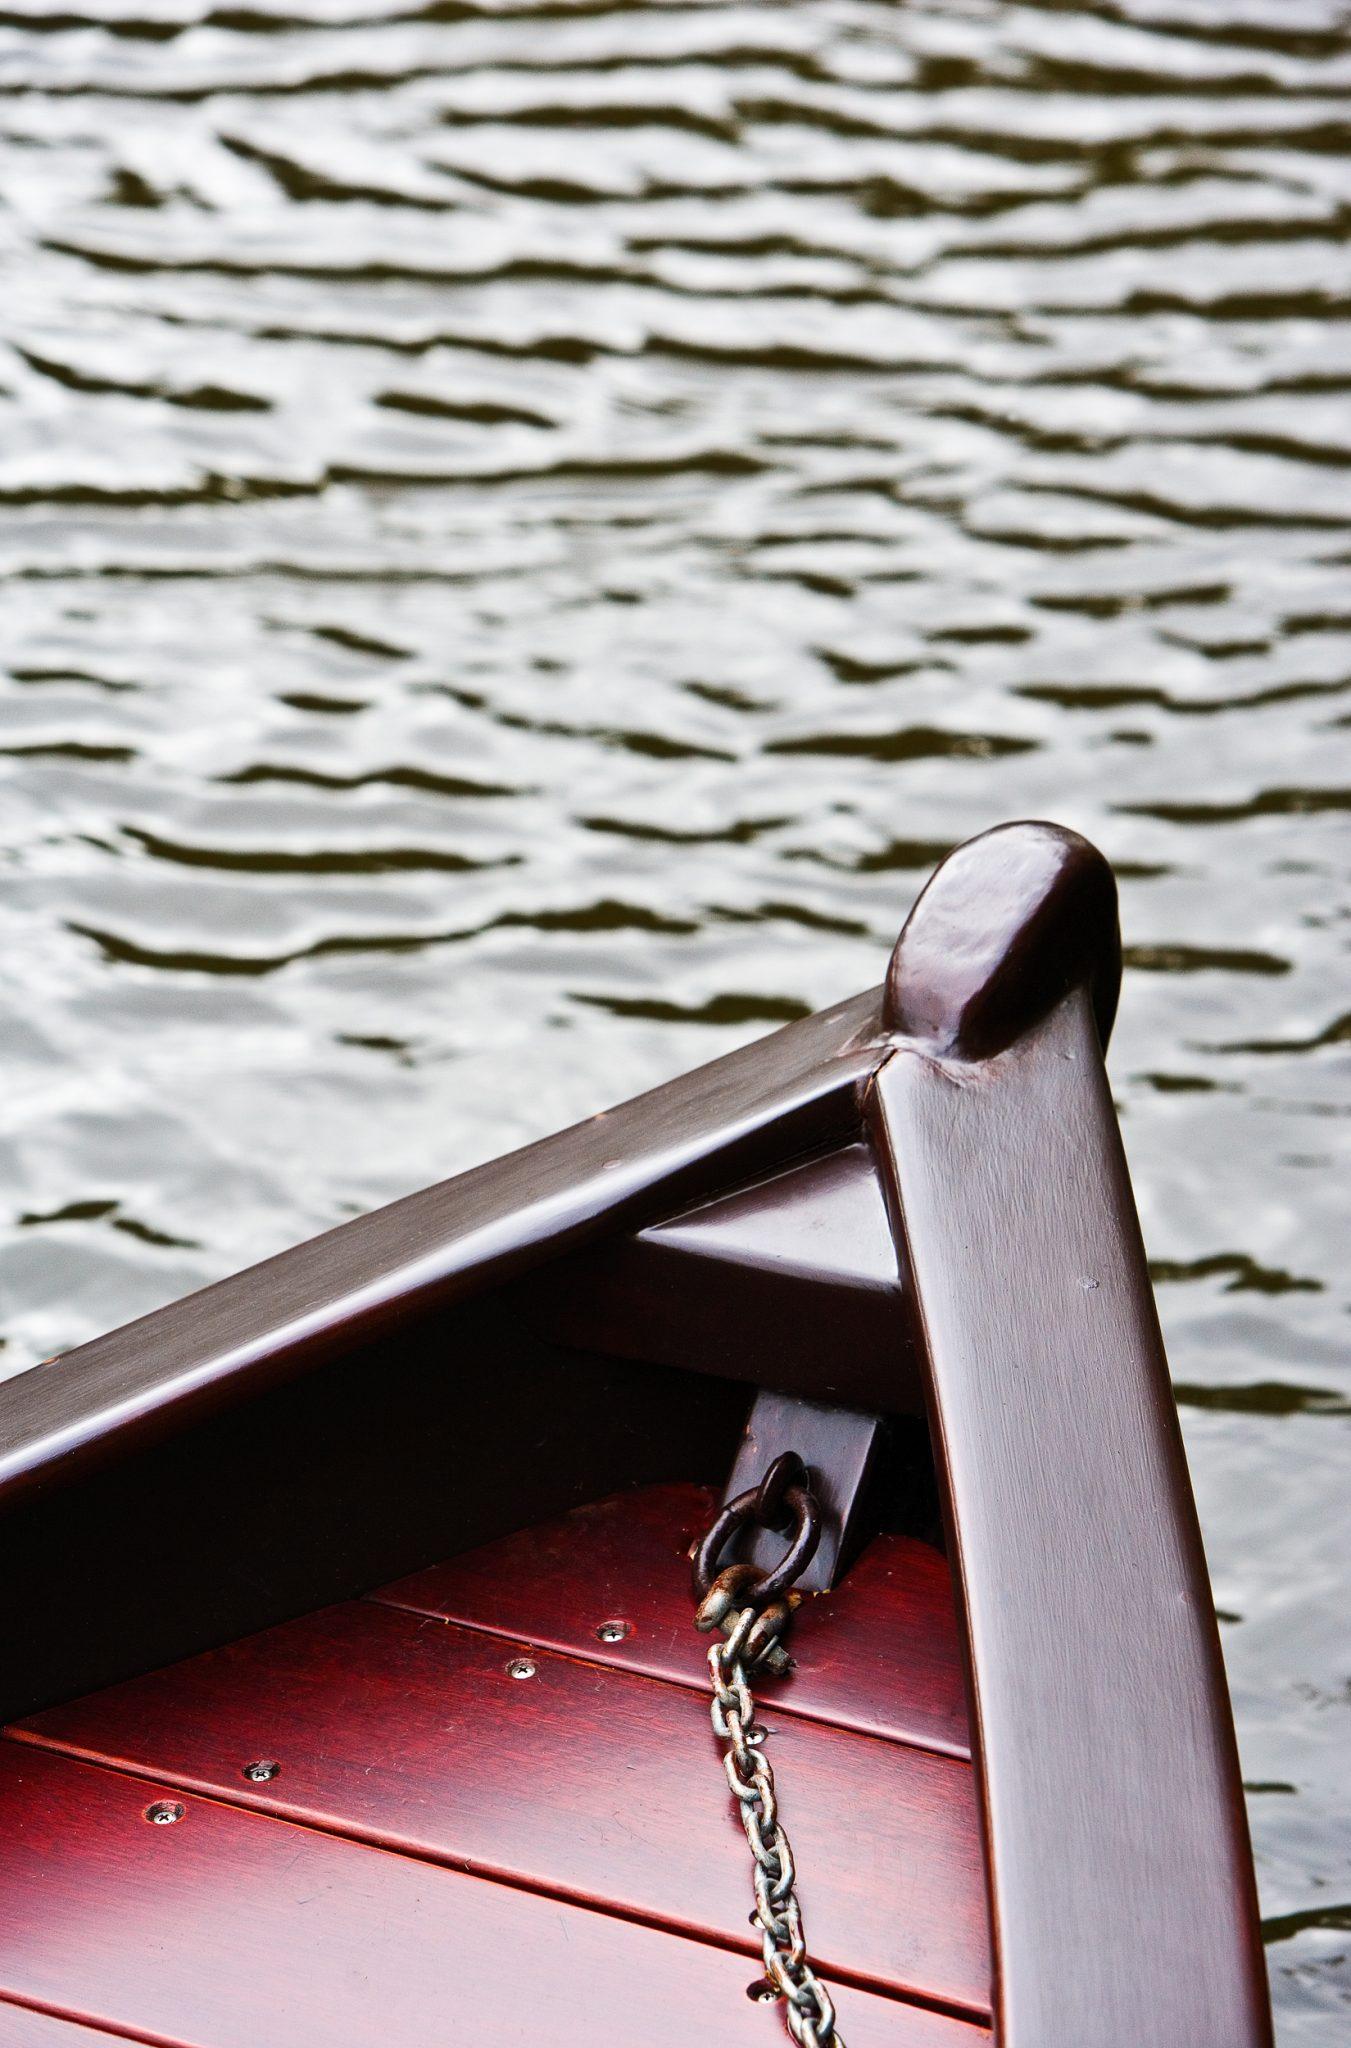 Beautifully kept old wooden row boat